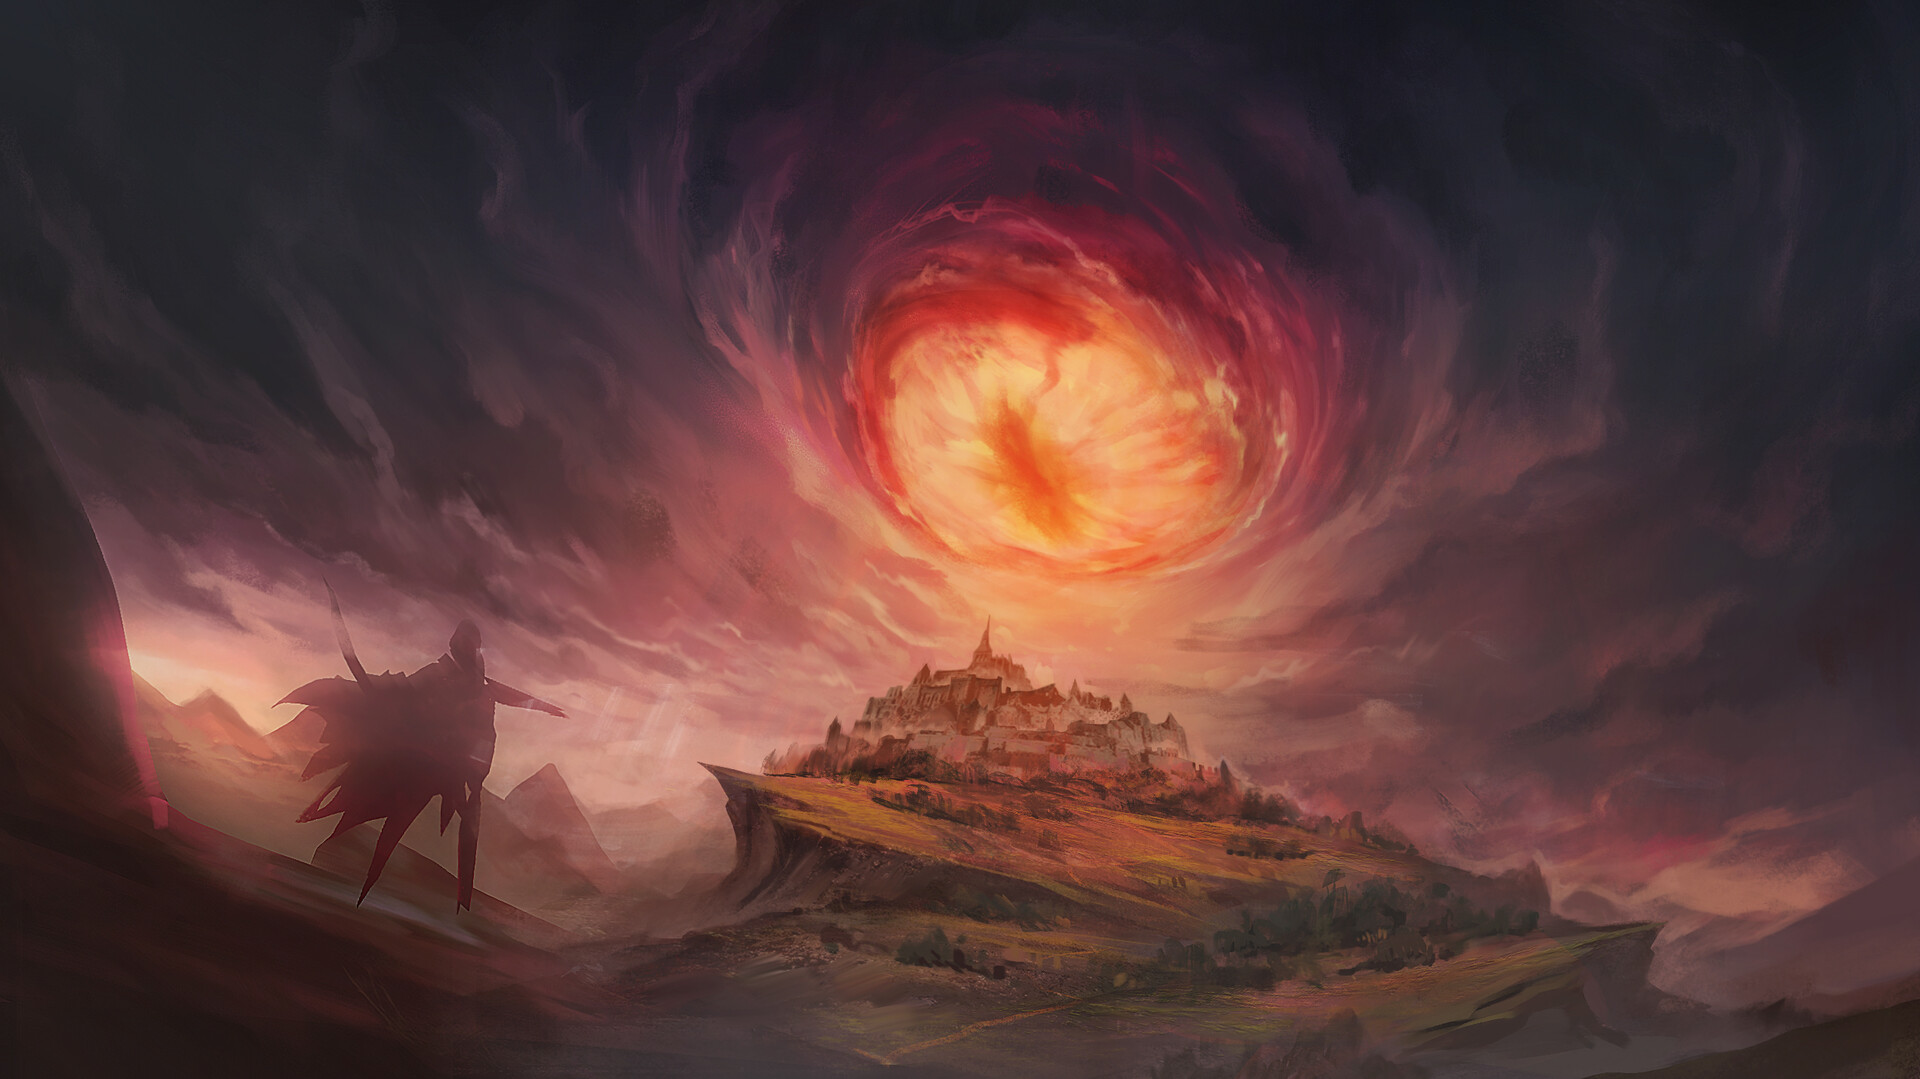 Thomas bourdon eye of the storm sketch 2